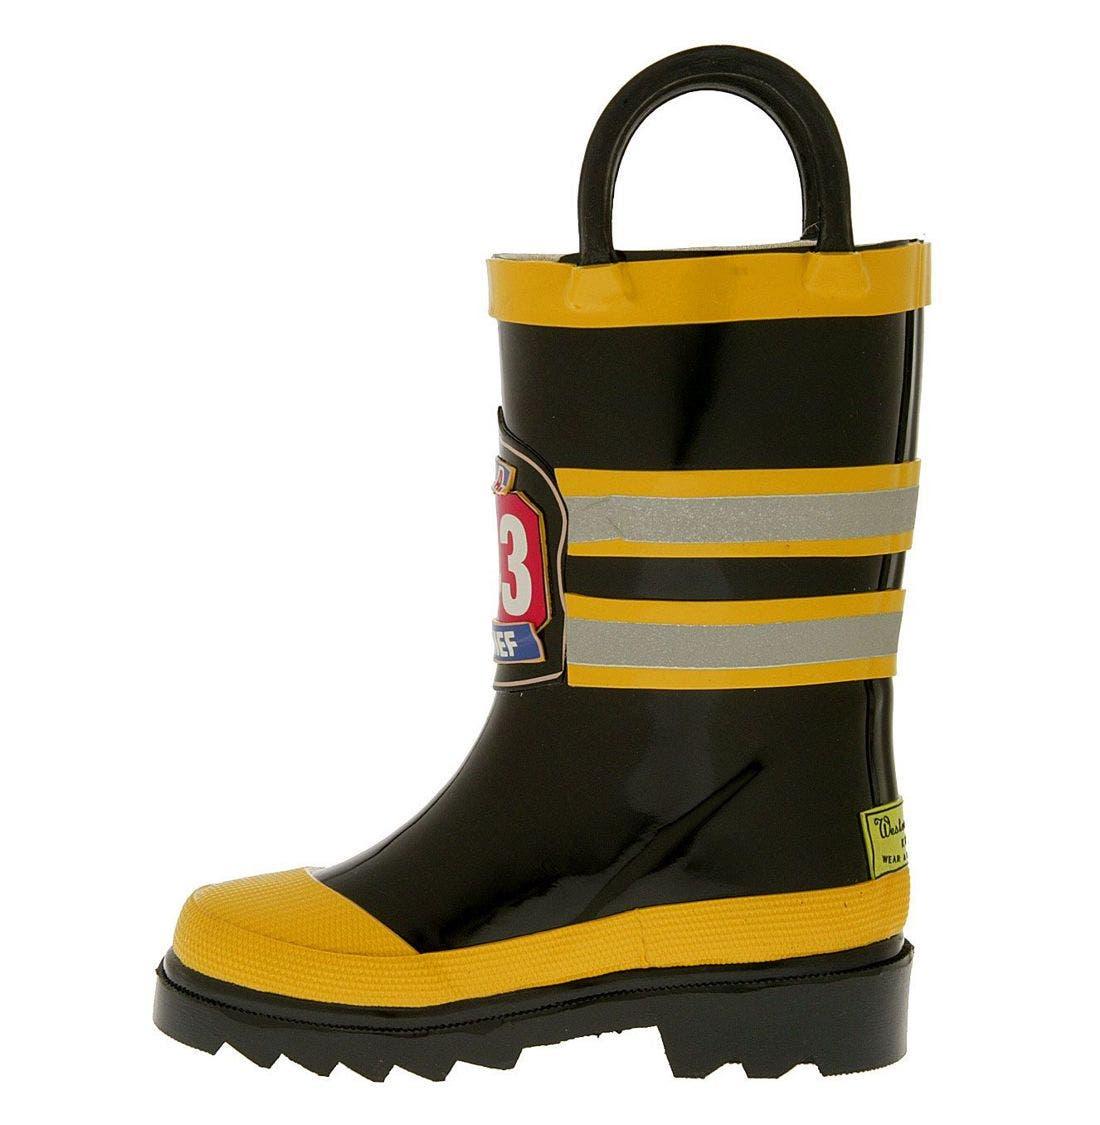 'Fireman' Rain Boot,                             Alternate thumbnail 3, color,                             BYE